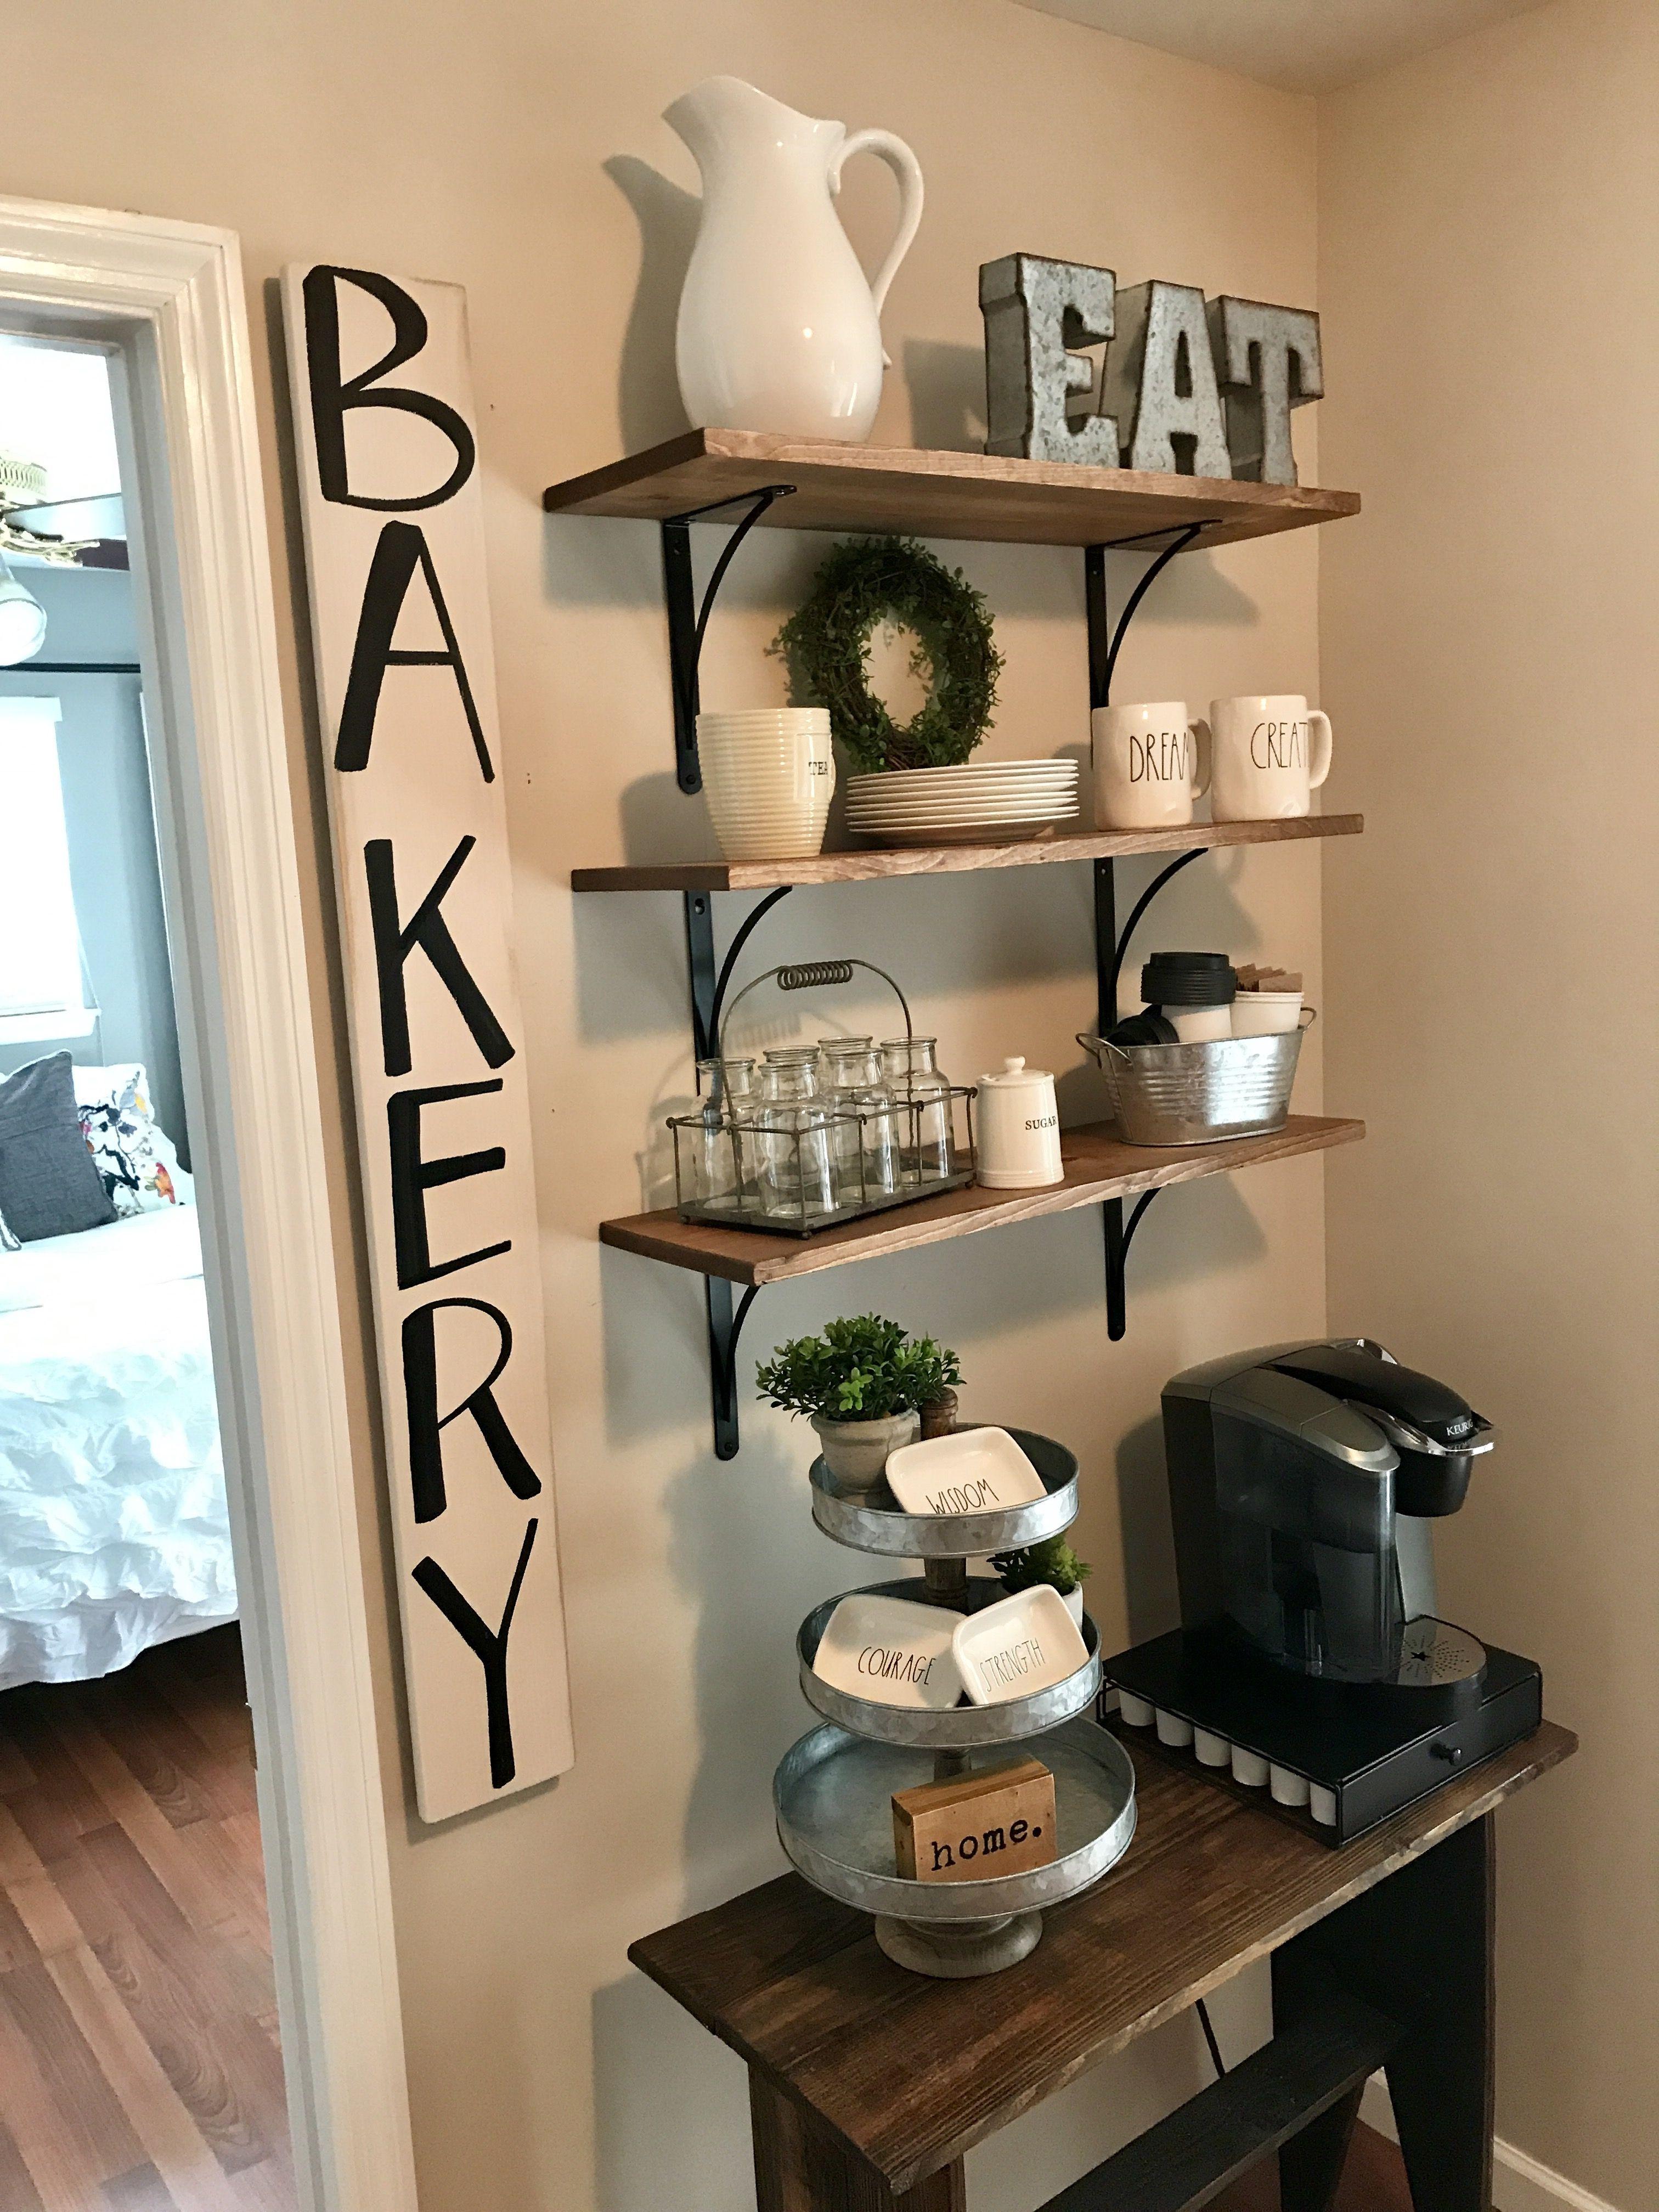 Rae Dunn, kitchen shelving, bakery, farmhouse Kitchen